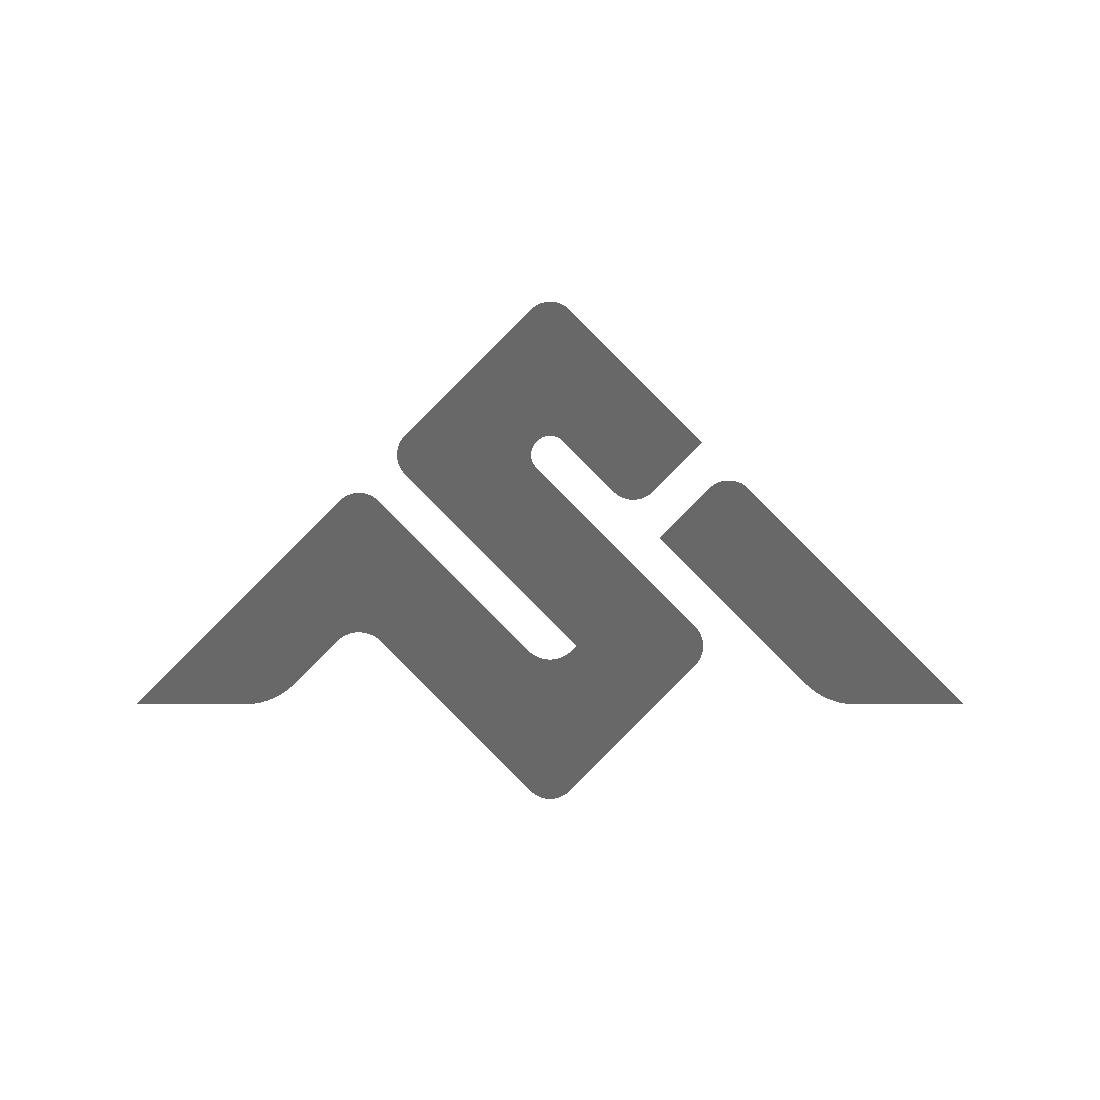 De Skating Chaussures Equipe Ski Shop 8 Magasin Salomon Fond Achat FWRwgUaq